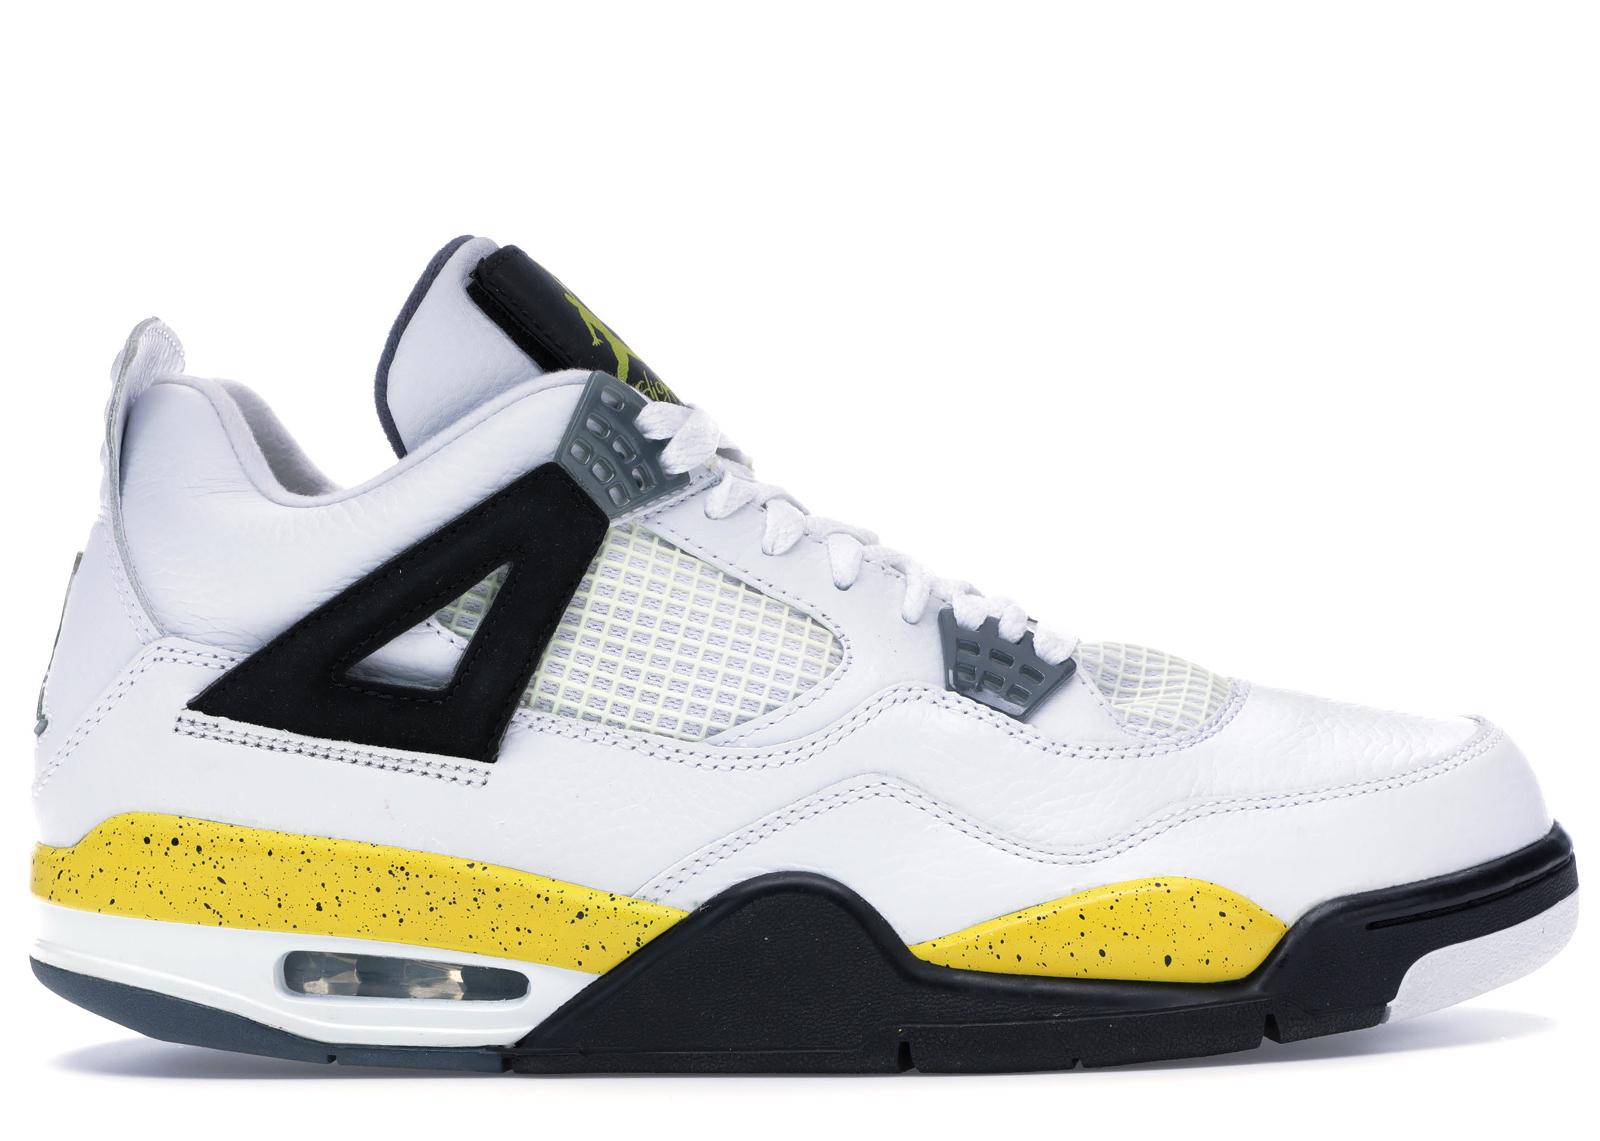 Jordan 4 Retro Tour Yellow / Rare Air